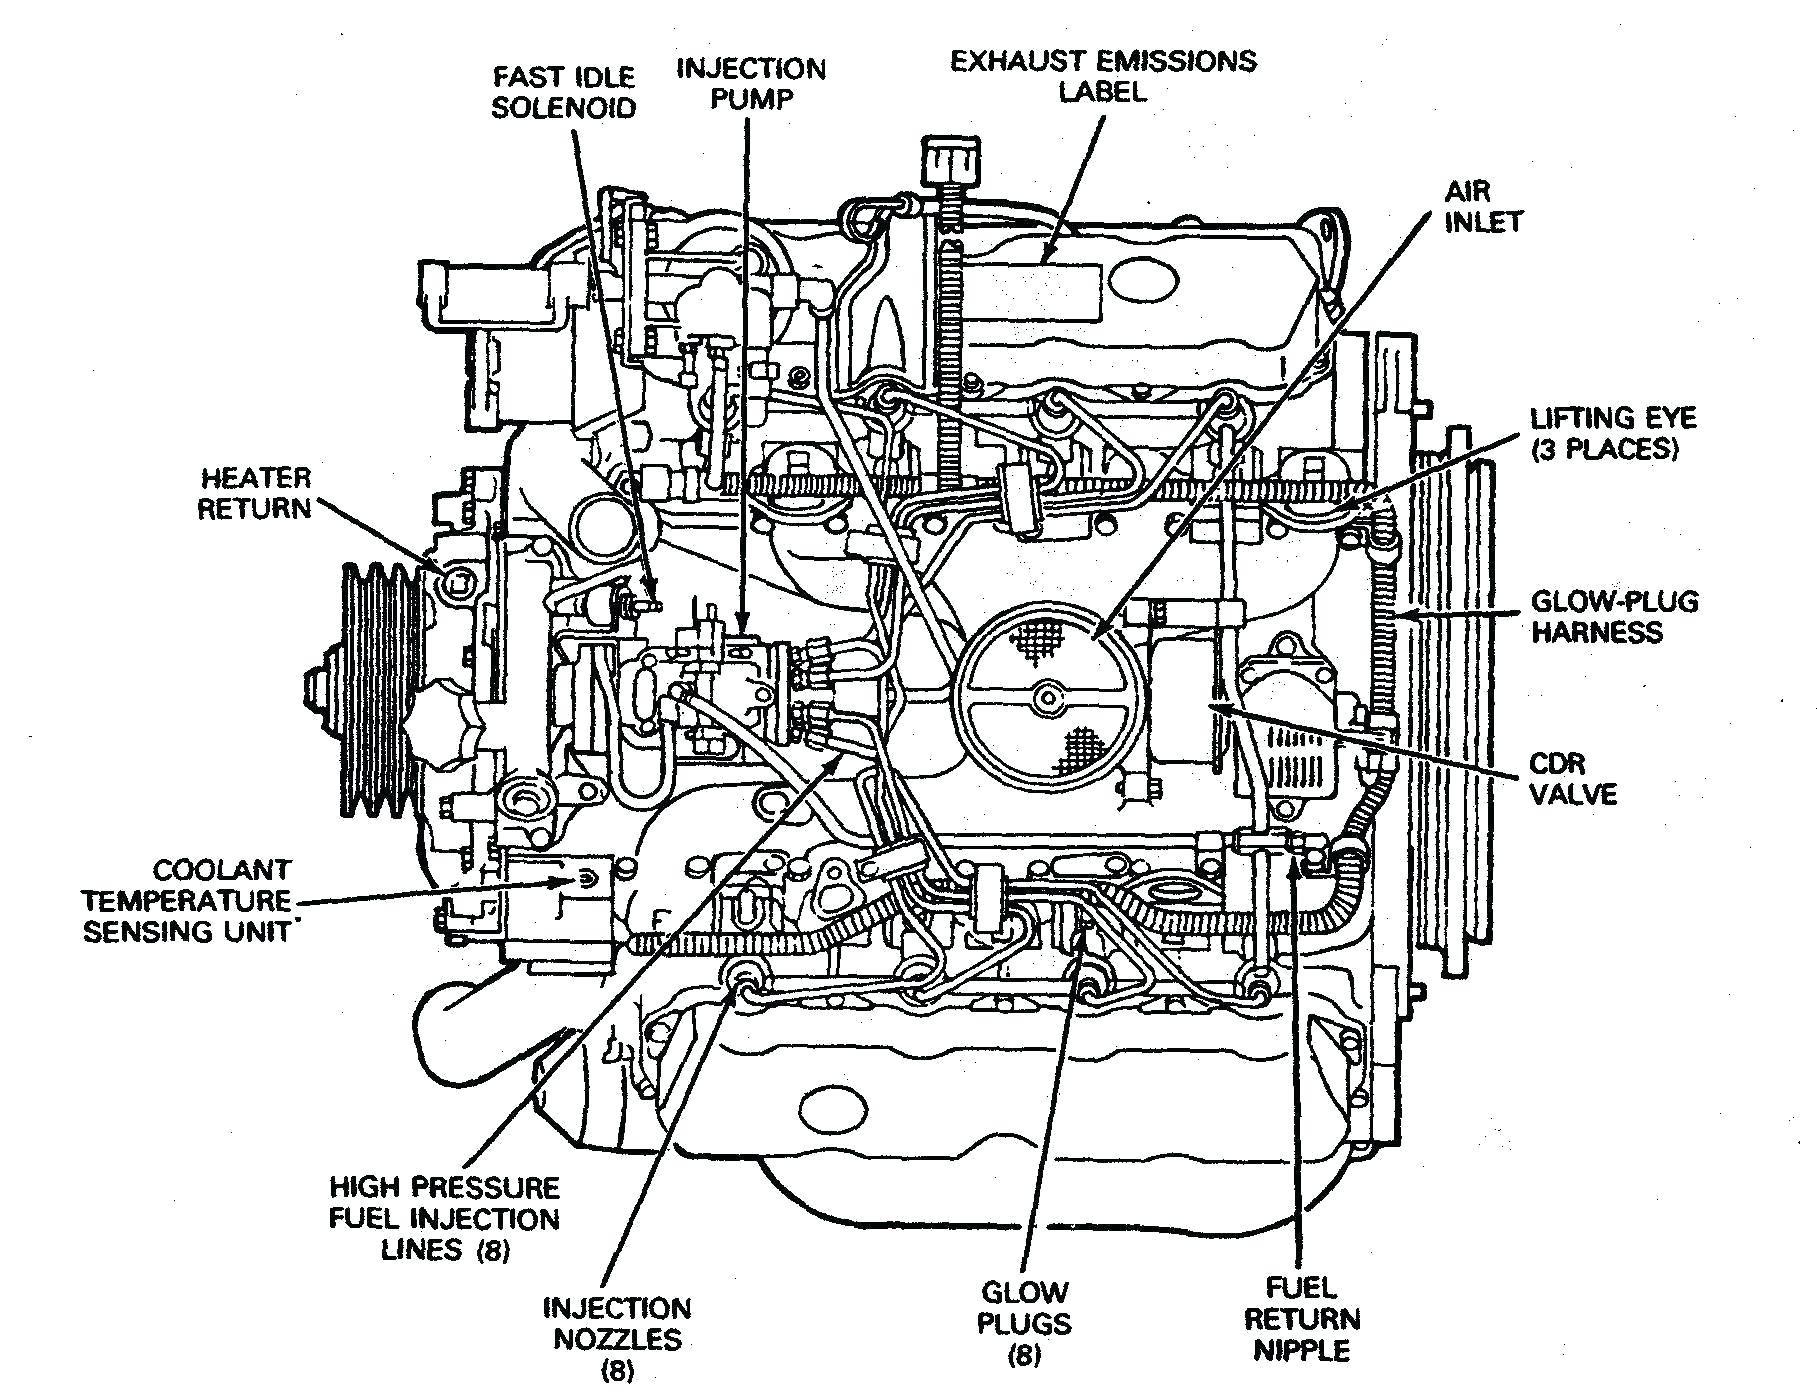 2000 ford Explorer Parts Diagram Kawasaki Engine Parts Diagram Delighted Inspiration Of 2000 ford Explorer Parts Diagram